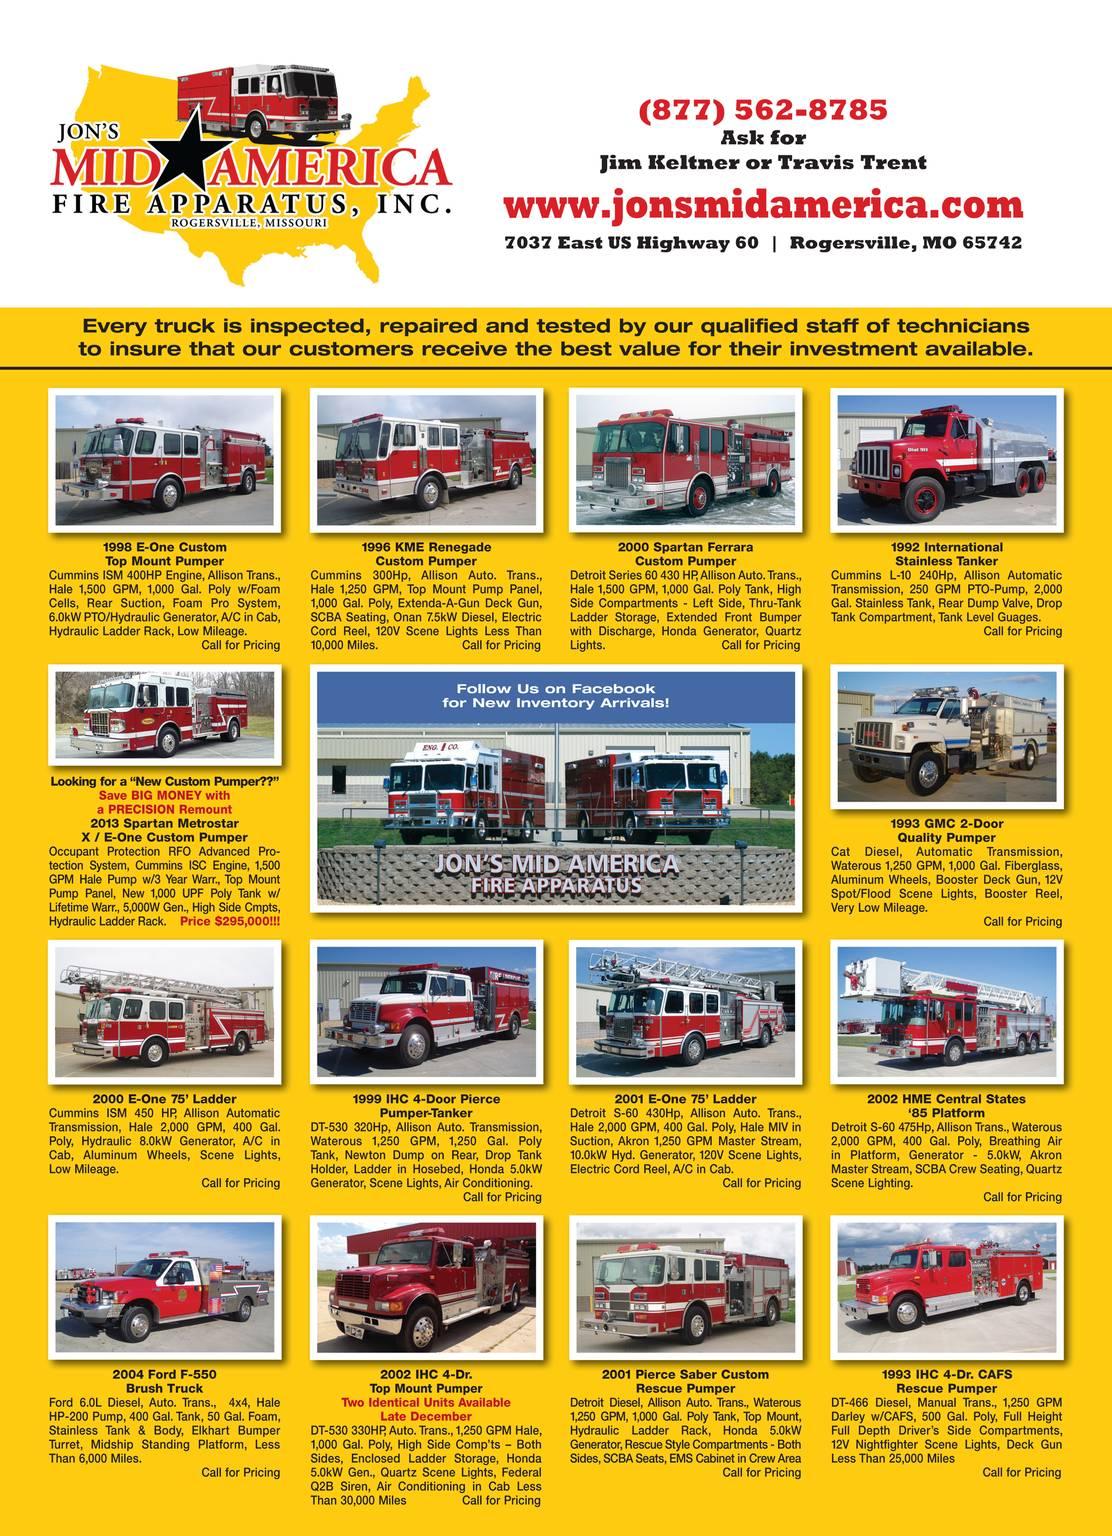 Fire Apparatus Magazine - November 2013 - page 46